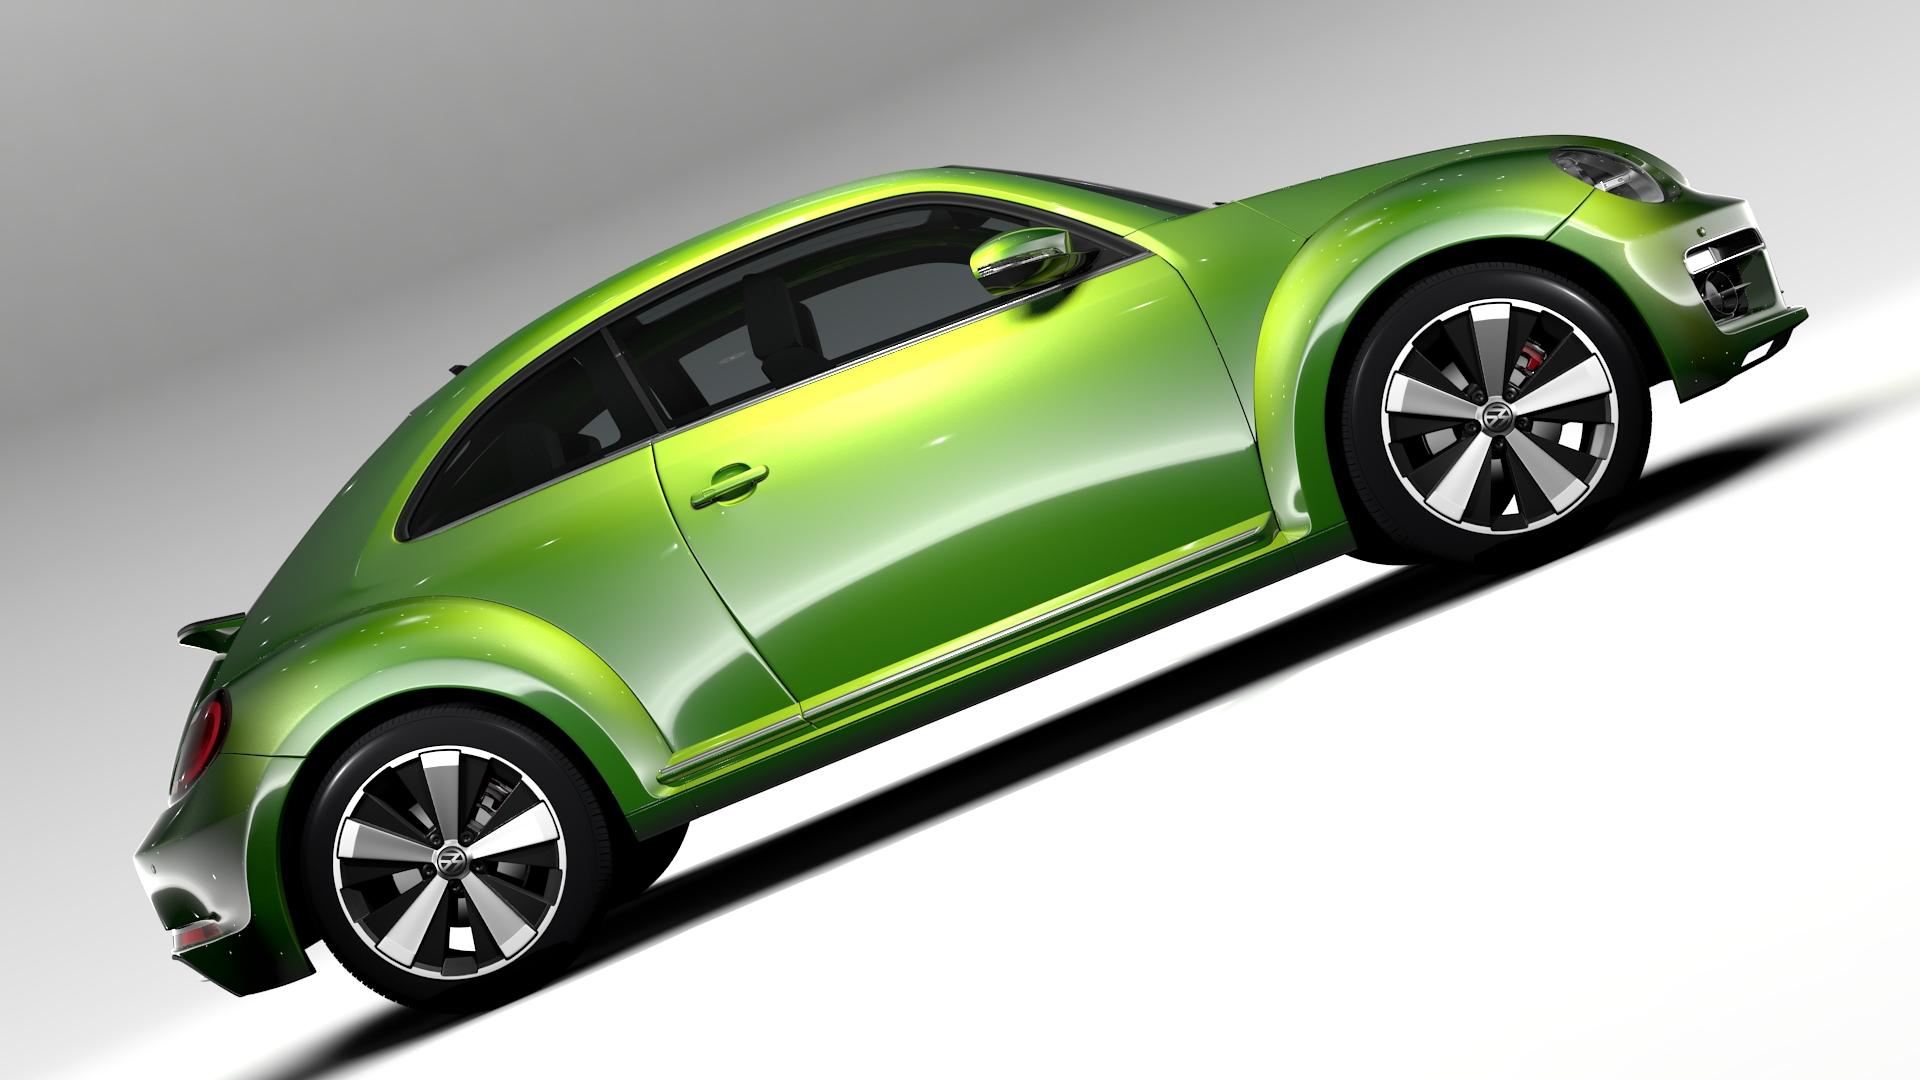 vw beetle 2017 3d model 3ds max fbx c4d lwo ma mb hrc xsi obj 221571